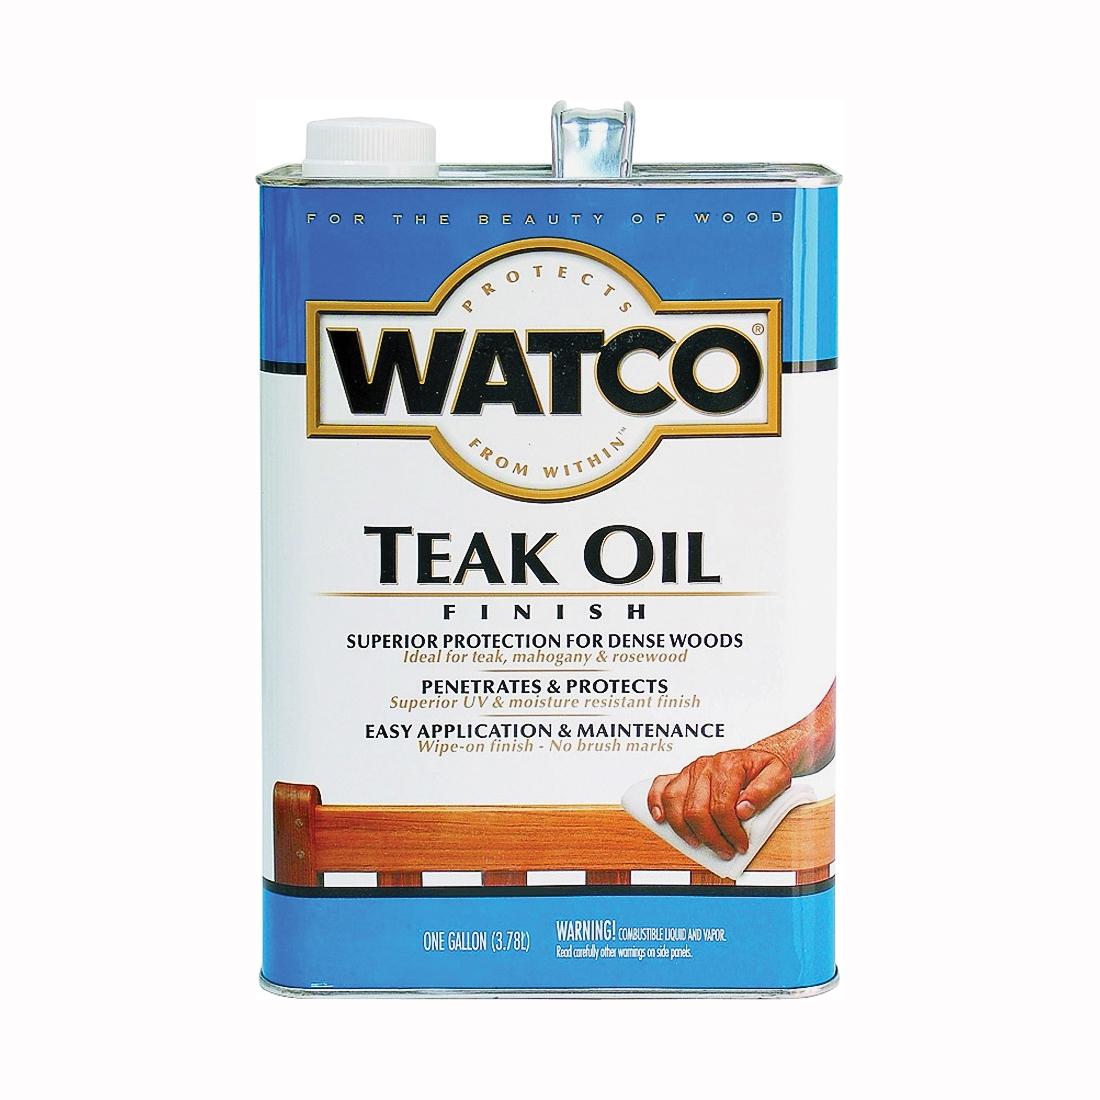 Picture of WATCO 67132 Teak Oil Finish, Liquid, 1 gal, Can